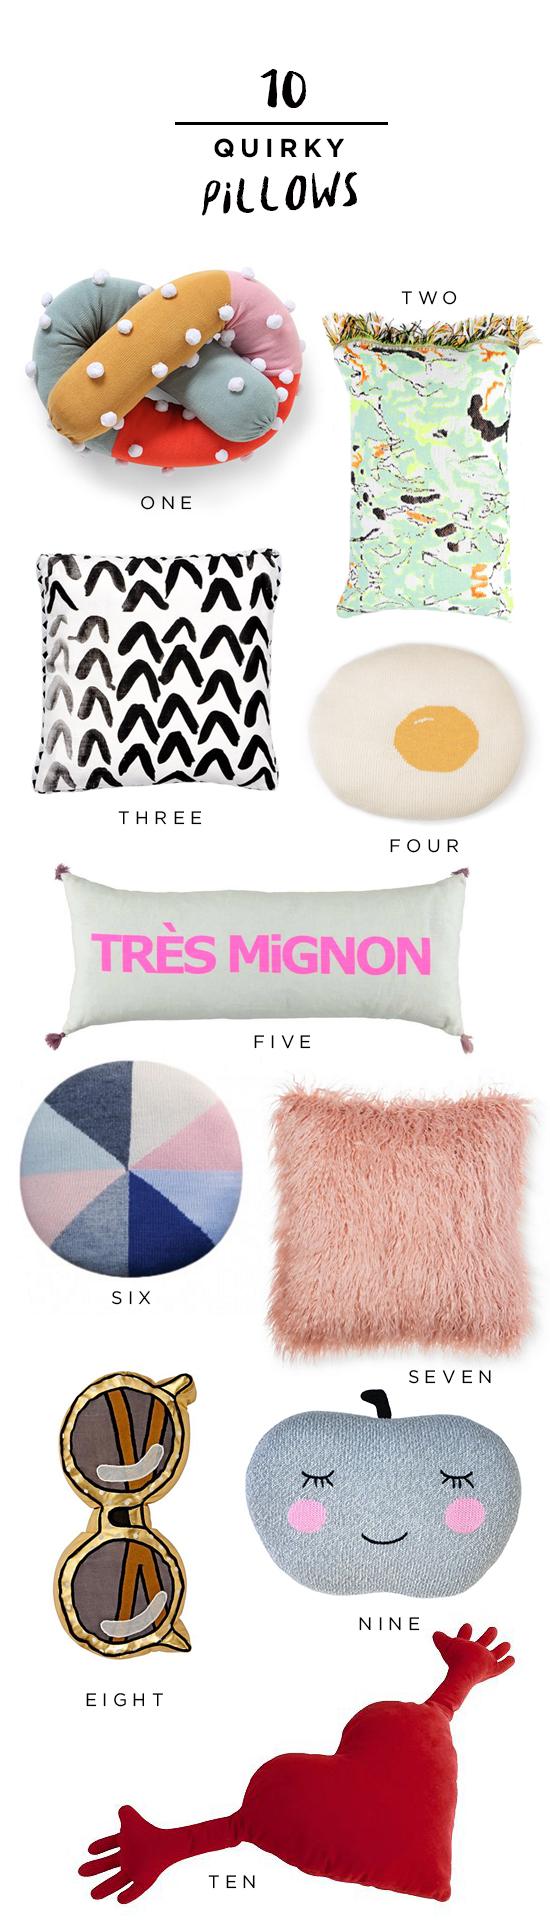 Quirky-pillows